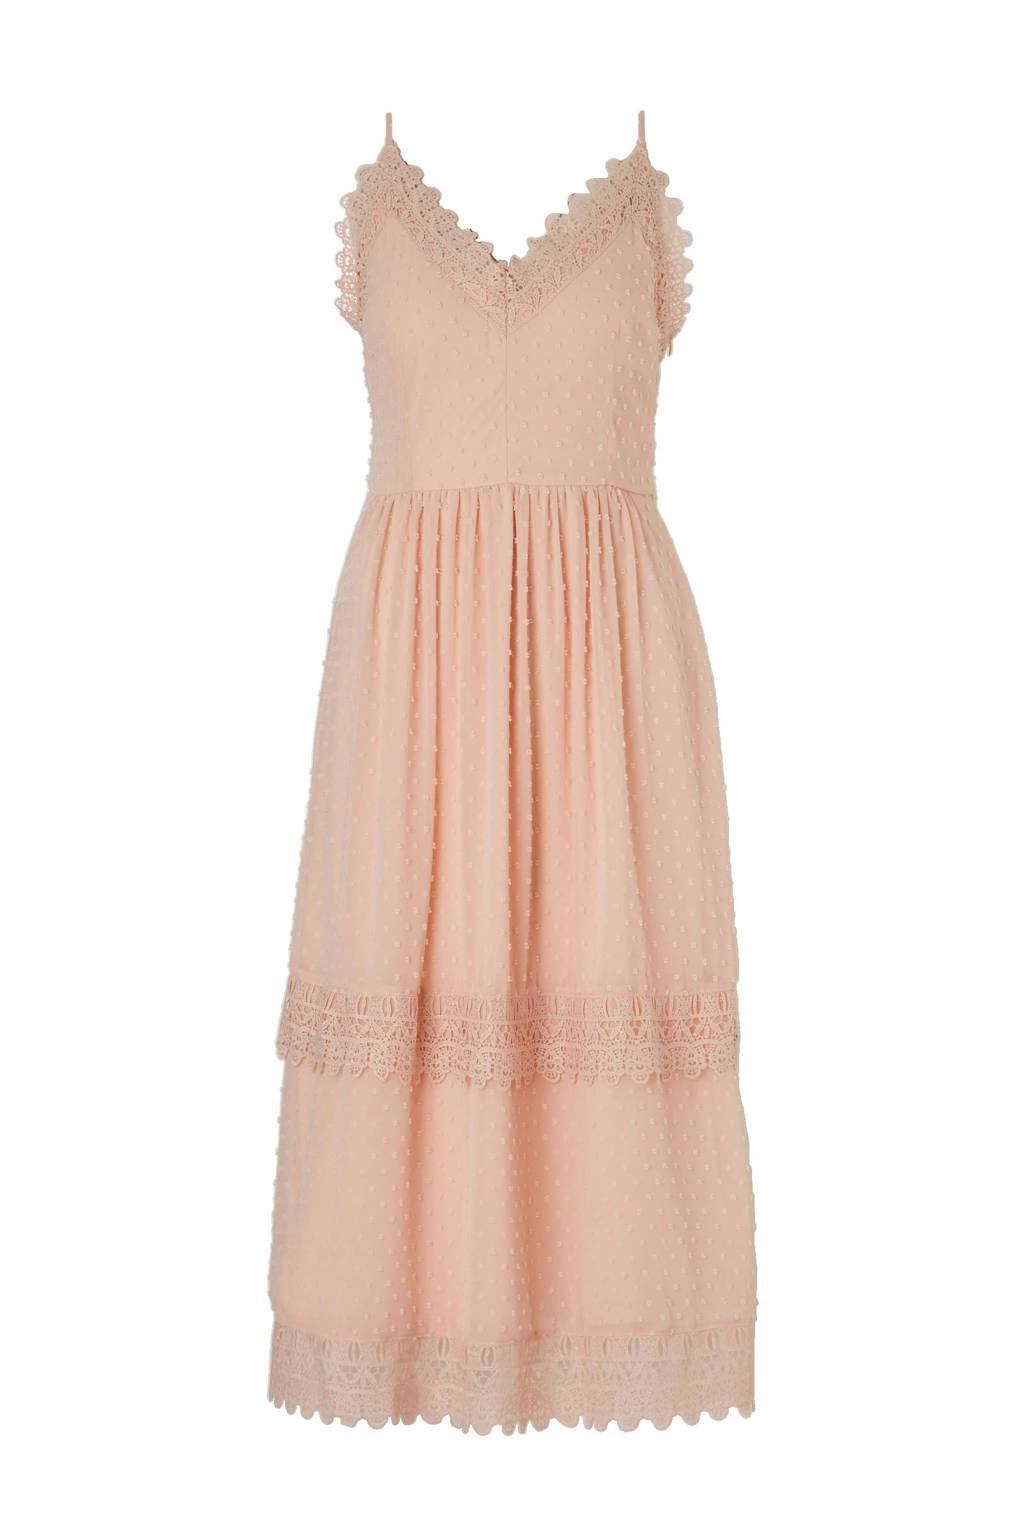 a477eecc06631f C A Yessica spaghetti jurk met kant